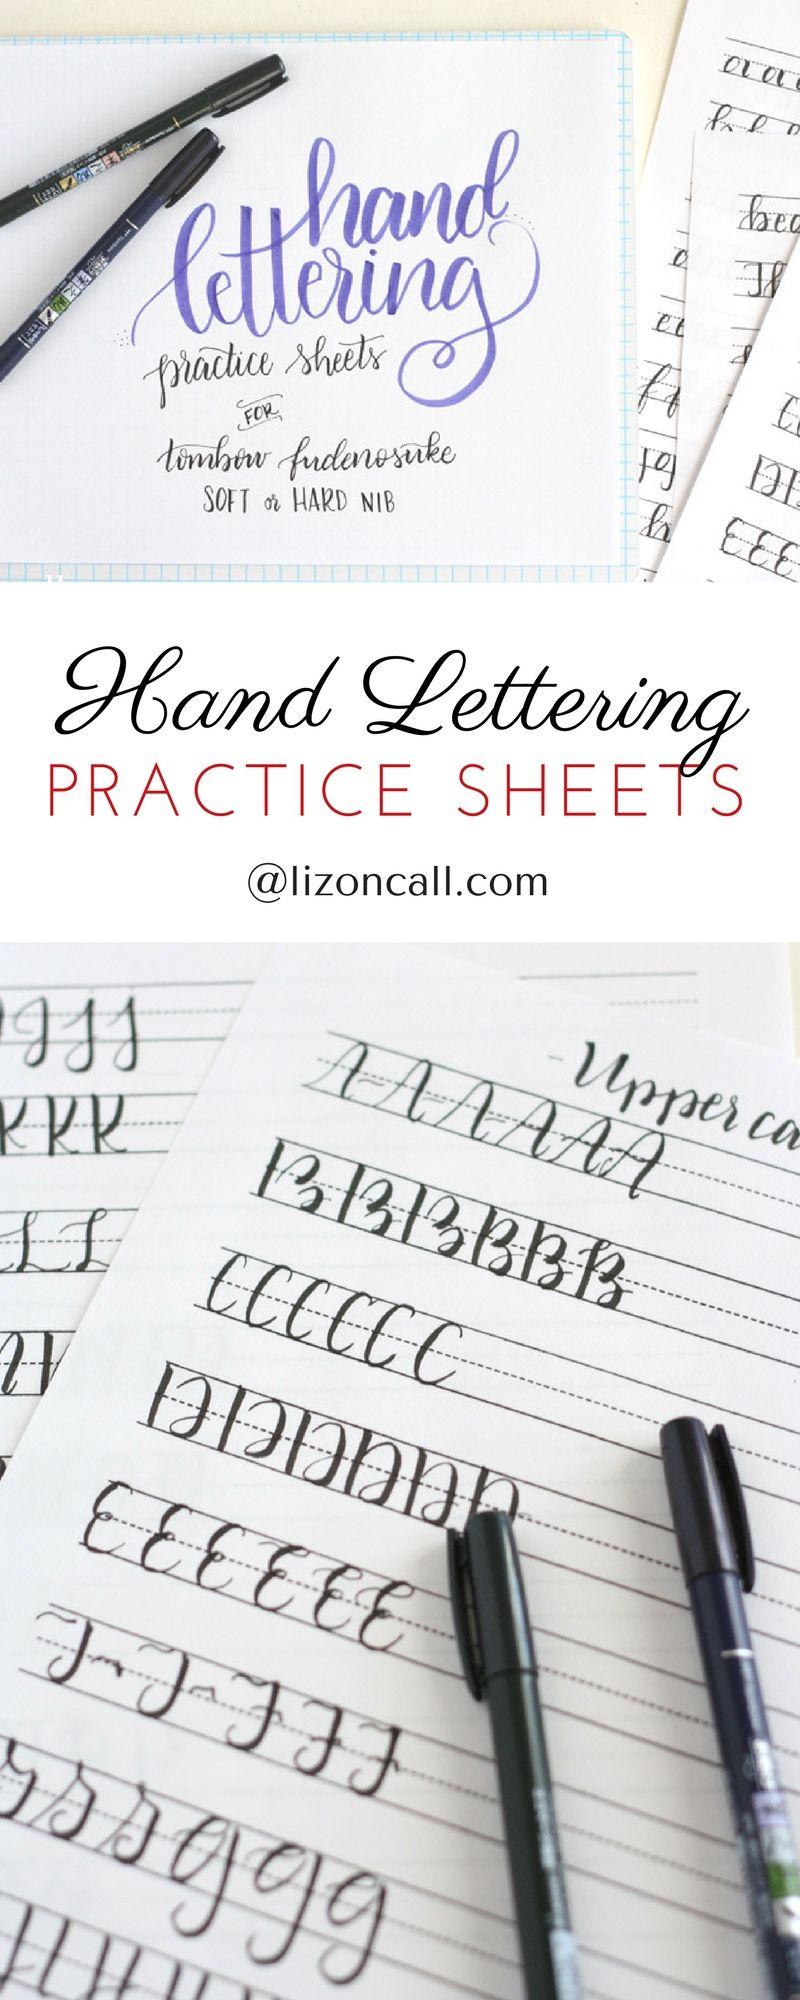 Predownload: Free Printable Hand Lettering Practice Sheets Liz On Call Hand Lettering Practice Sheets Hand Lettering Practice Hand Lettering Worksheet [ 2000 x 800 Pixel ]